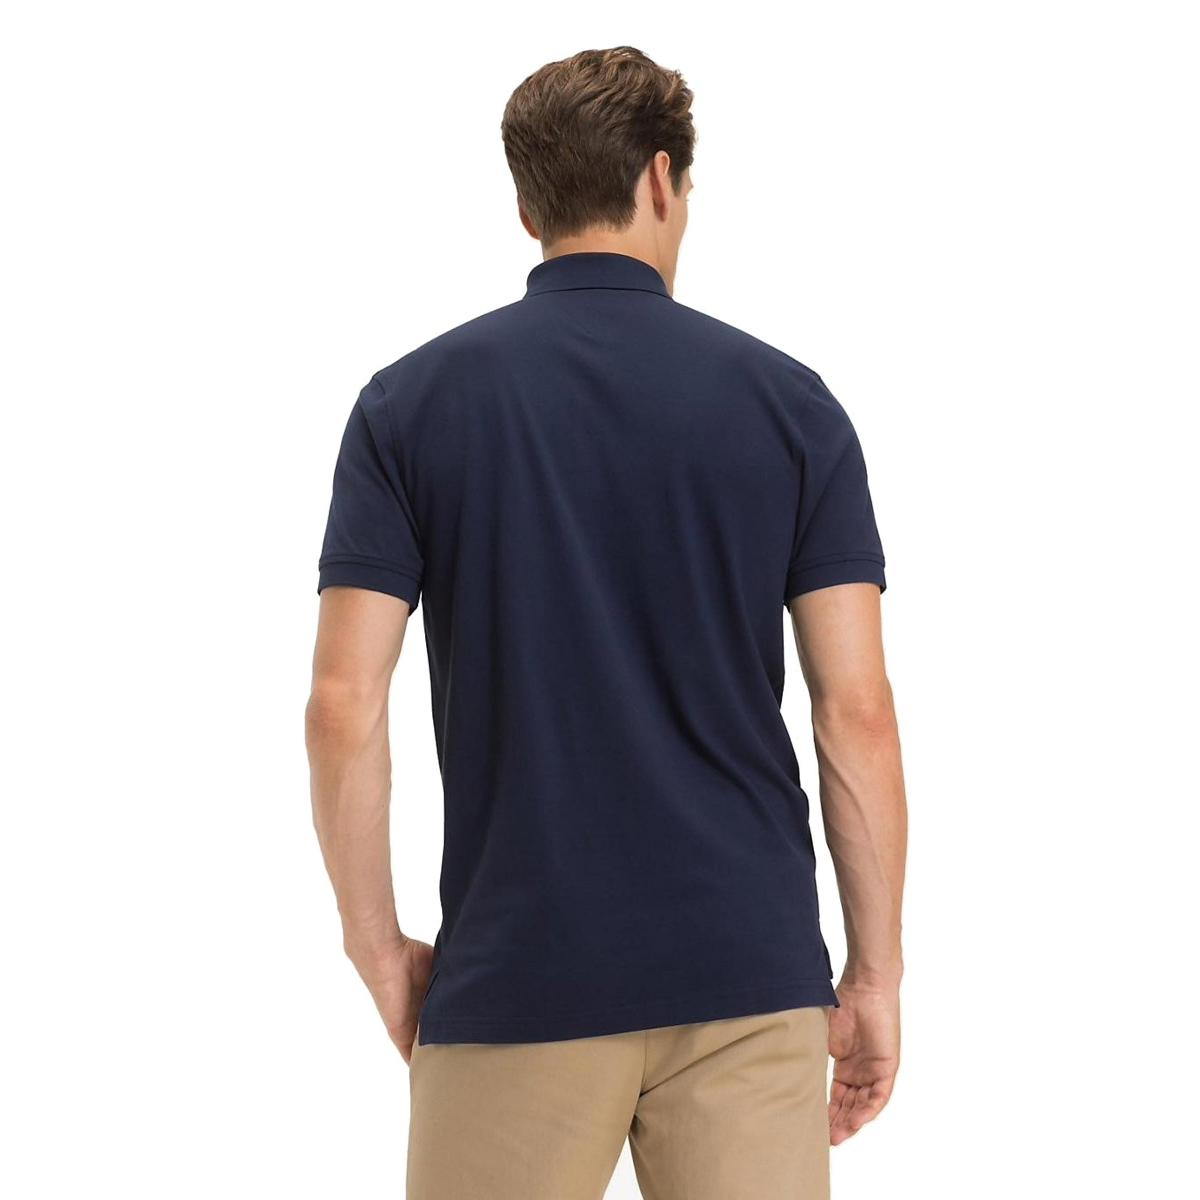 Polo Tommy Jeans in cotone stretch da uomo rif. DM0DM06112